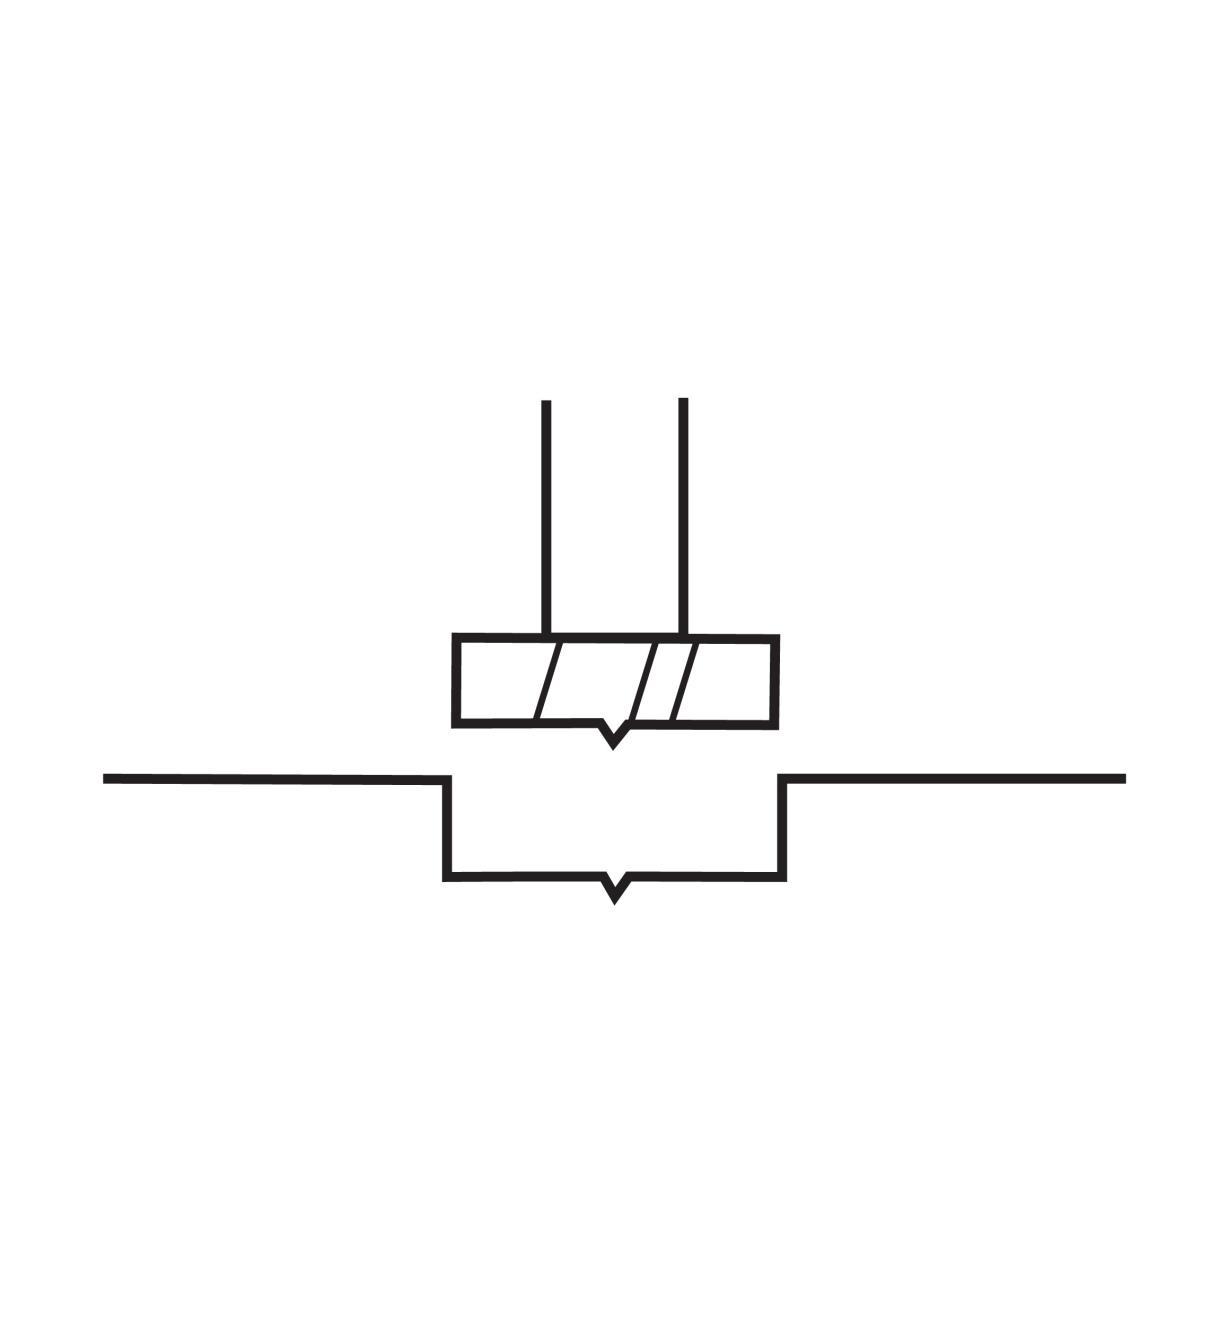 06J7104 - Mèche Forstner en acier rapide, 1/4po